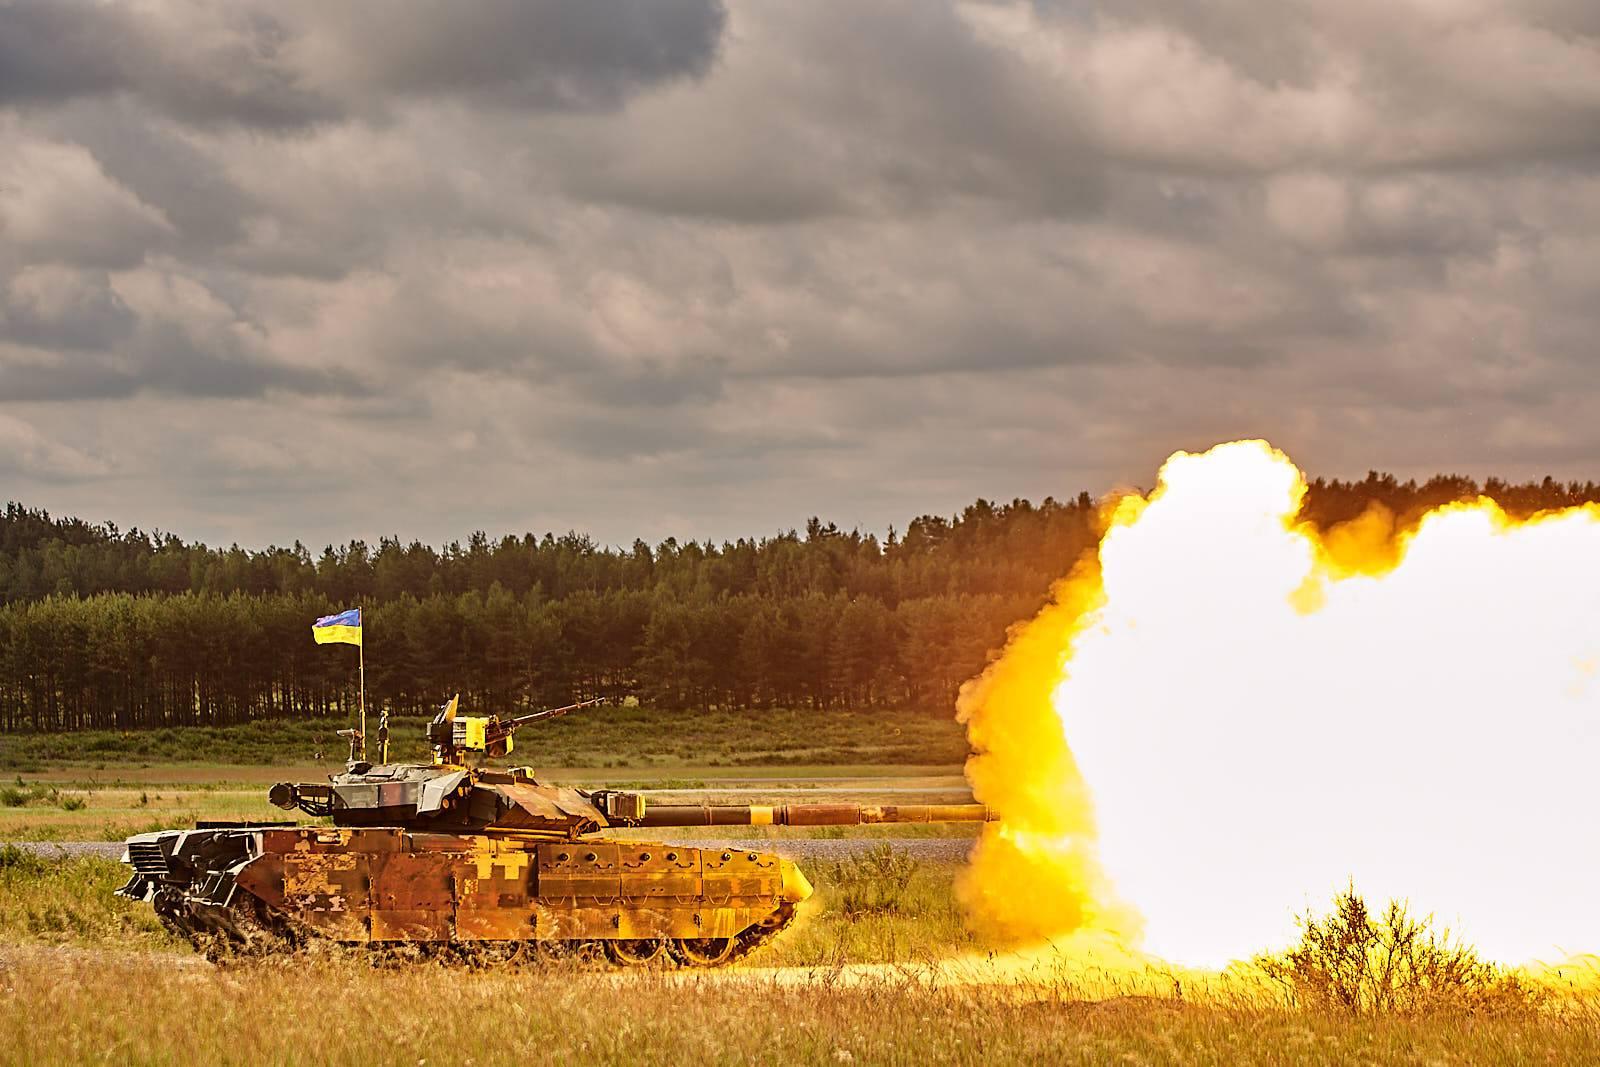 Дещо детальніше про Strong Europe Tank Challenge 2018